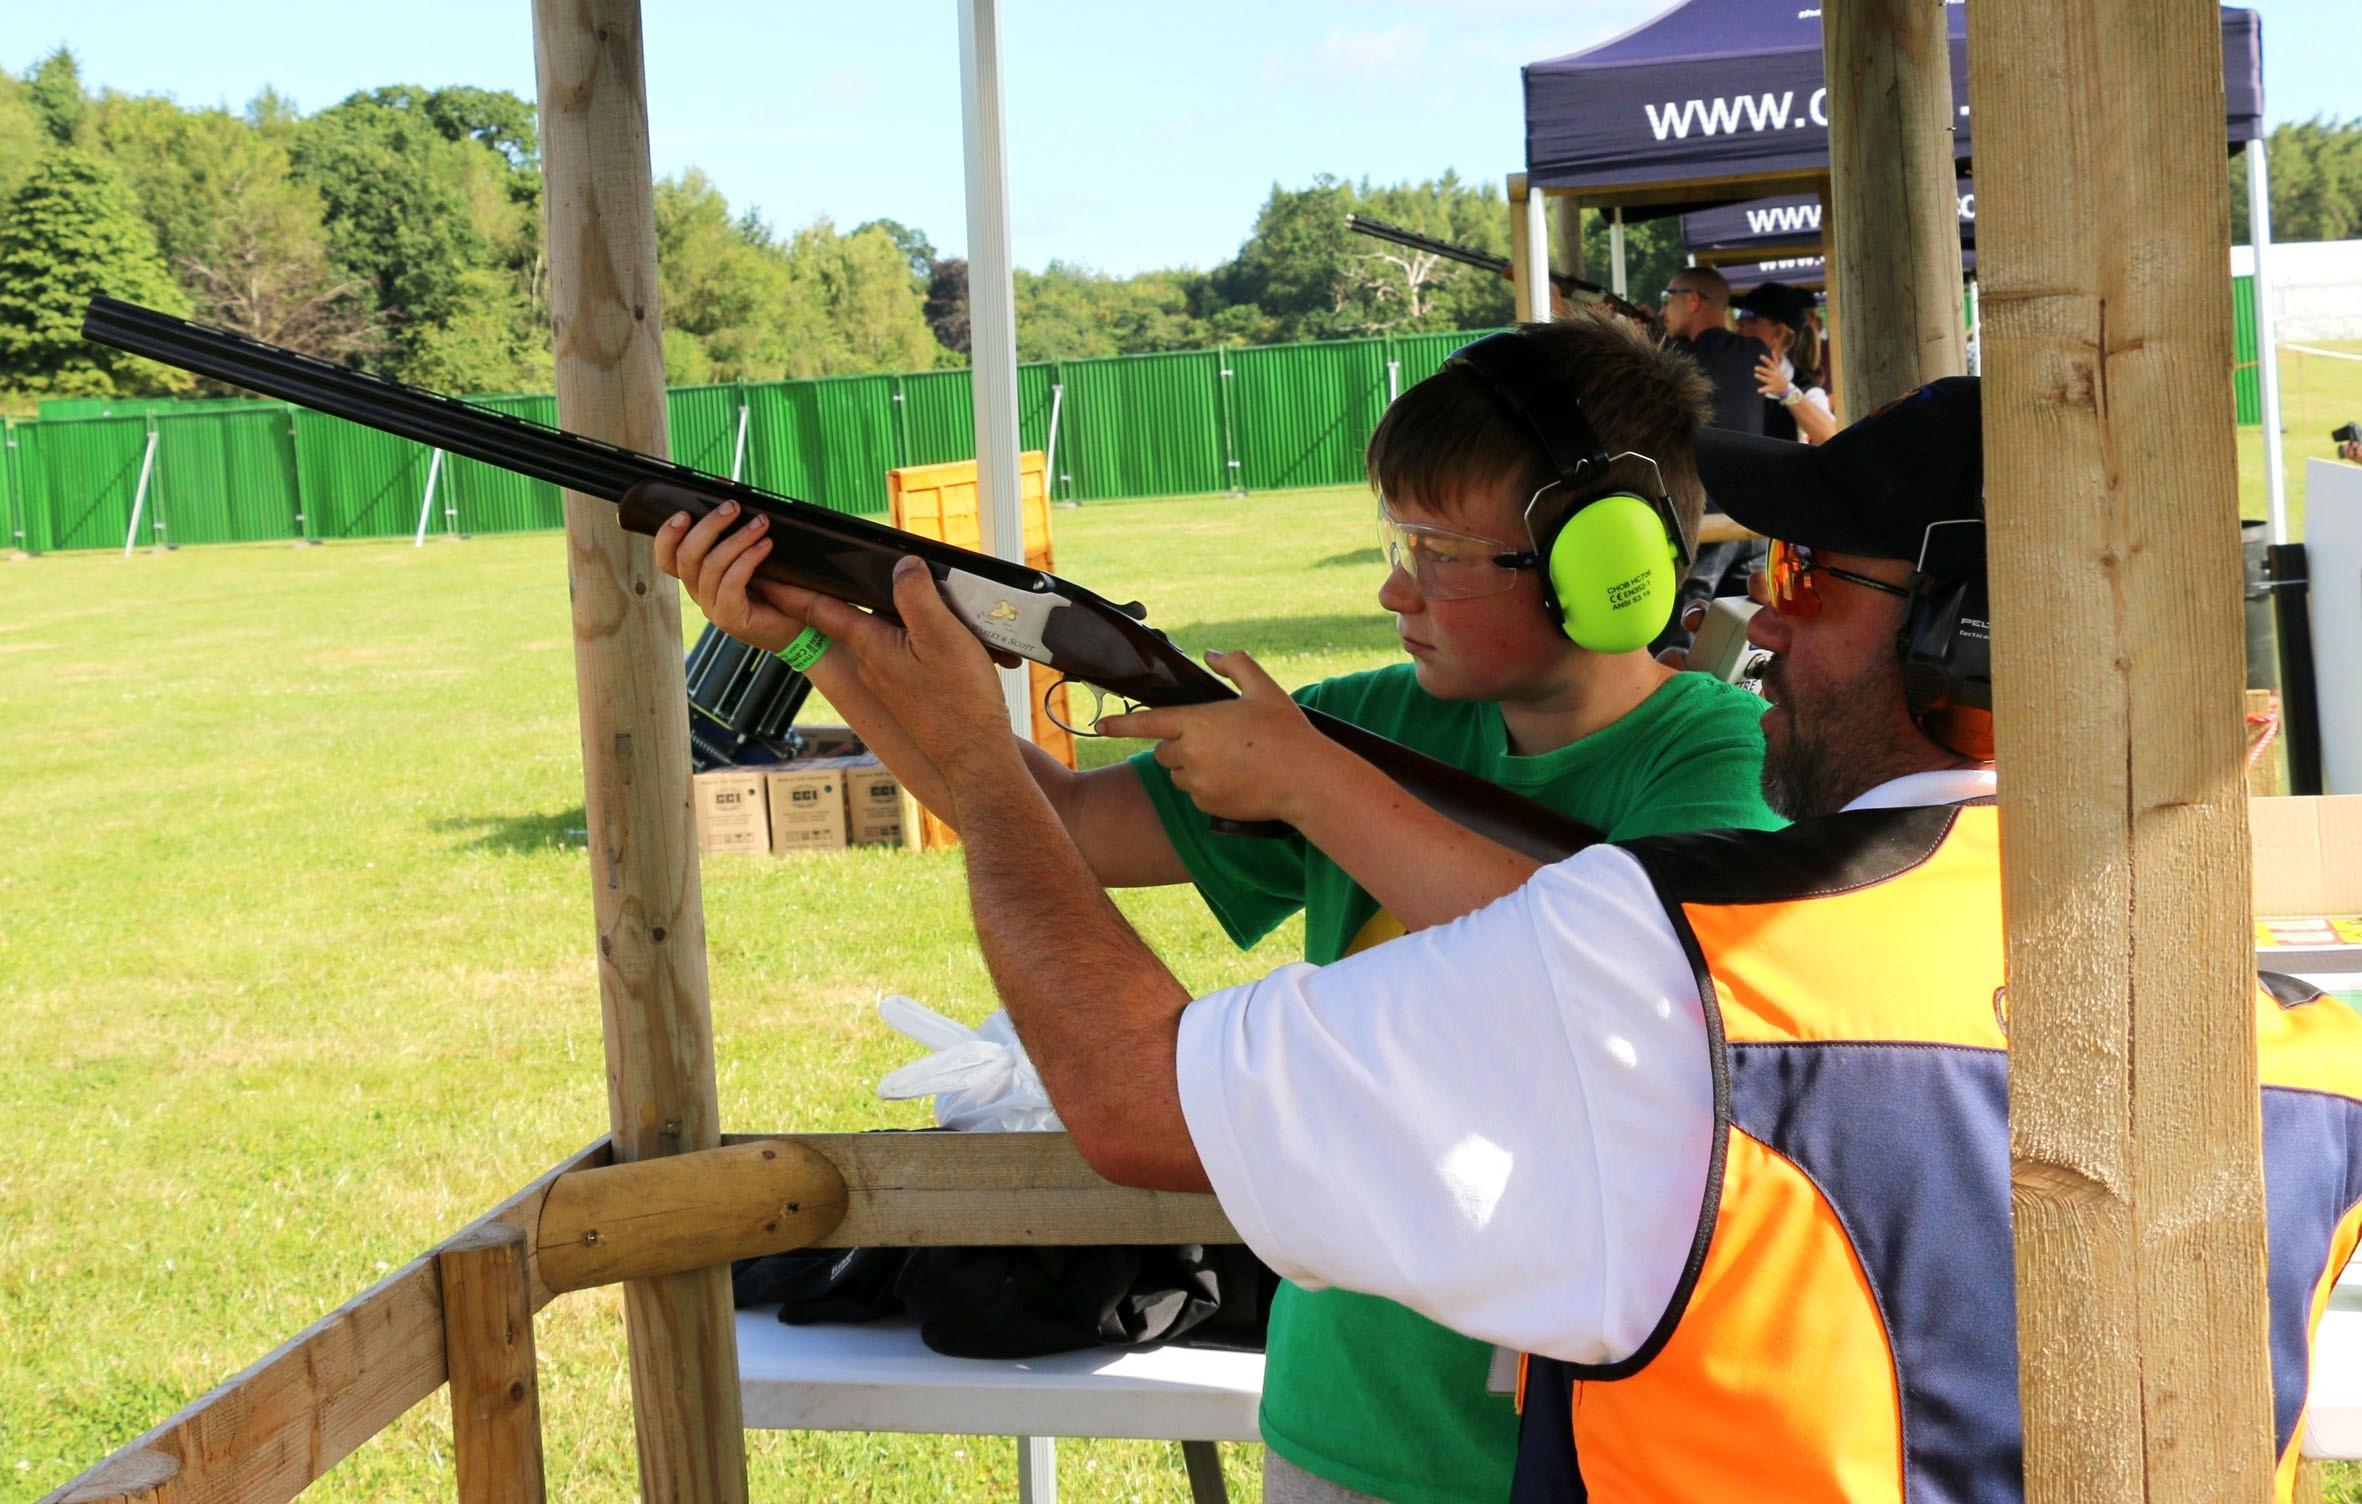 Nearly 100 CHILDREN authorised to use guns, data shows